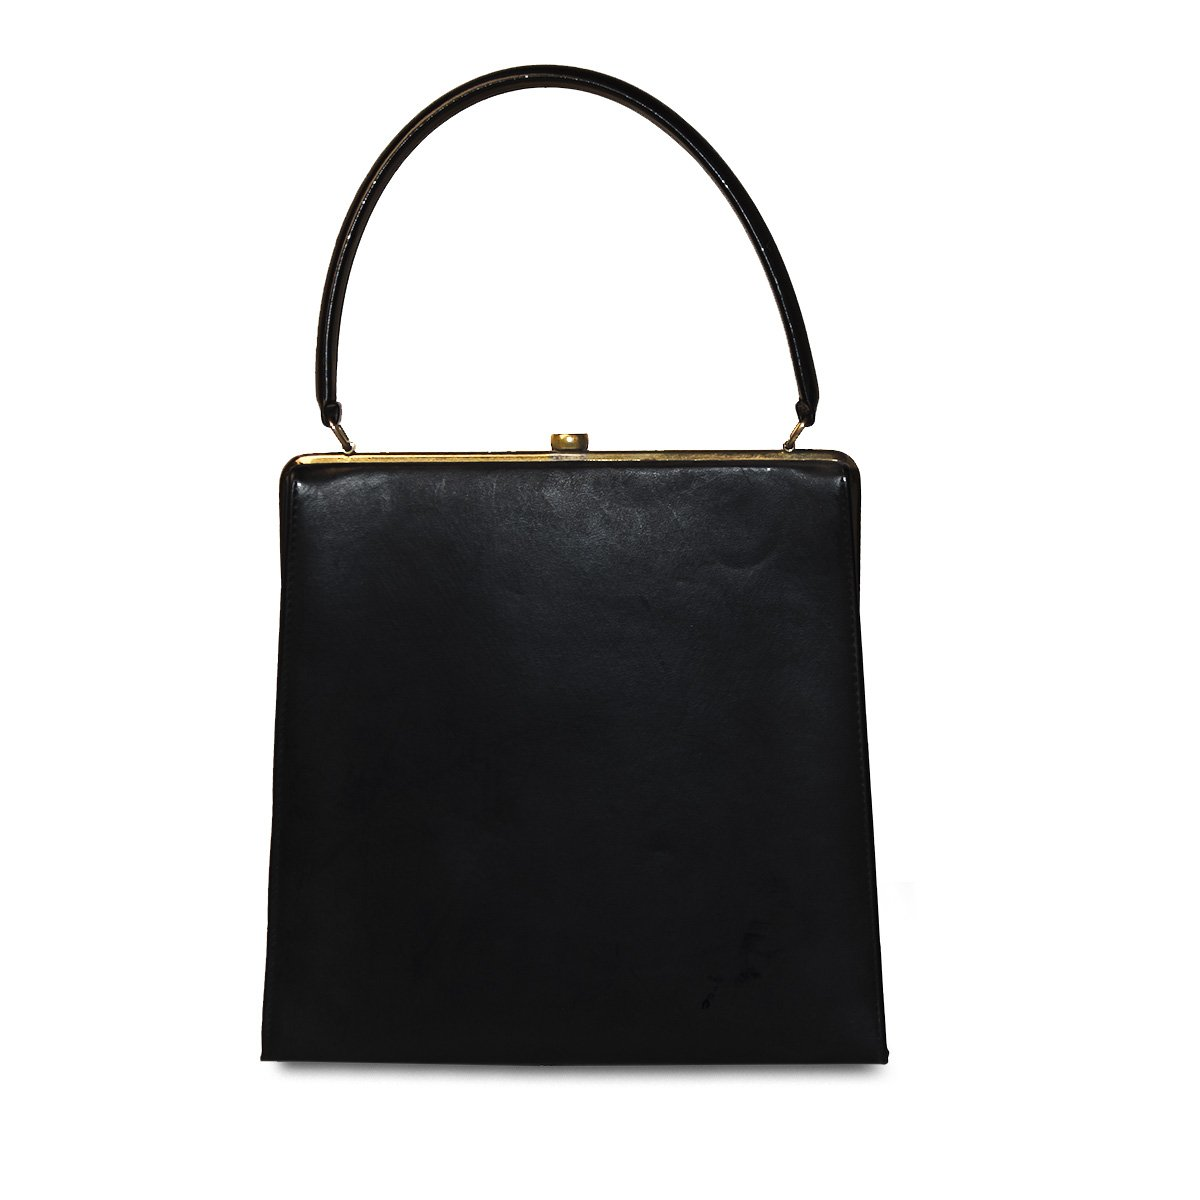 1950s Navy Blue Structured Handbag, Gold Hardware